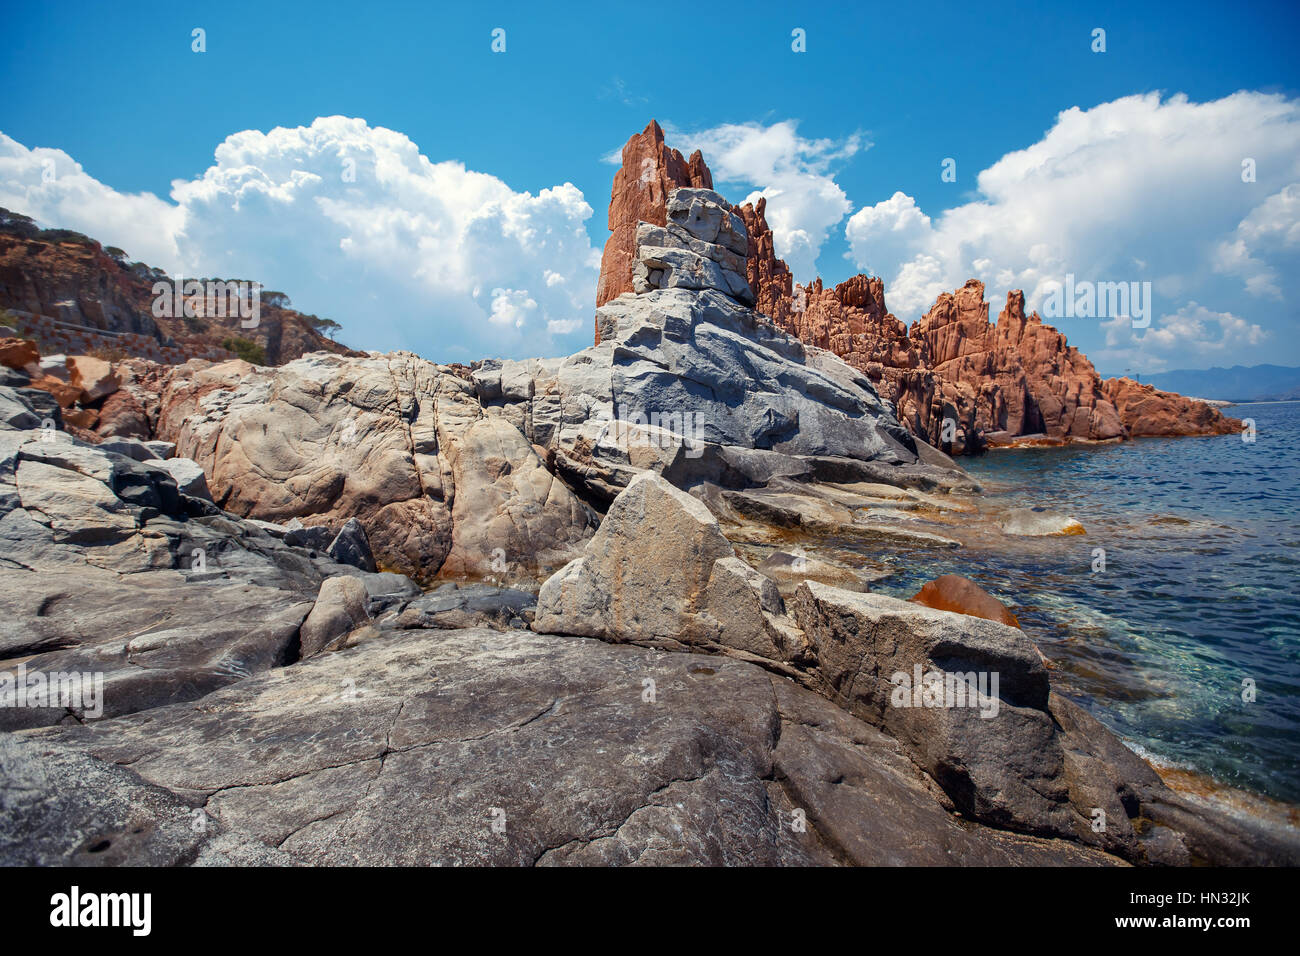 Red rocks and turquoise water of Arbatax, Sardinia - Stock Image